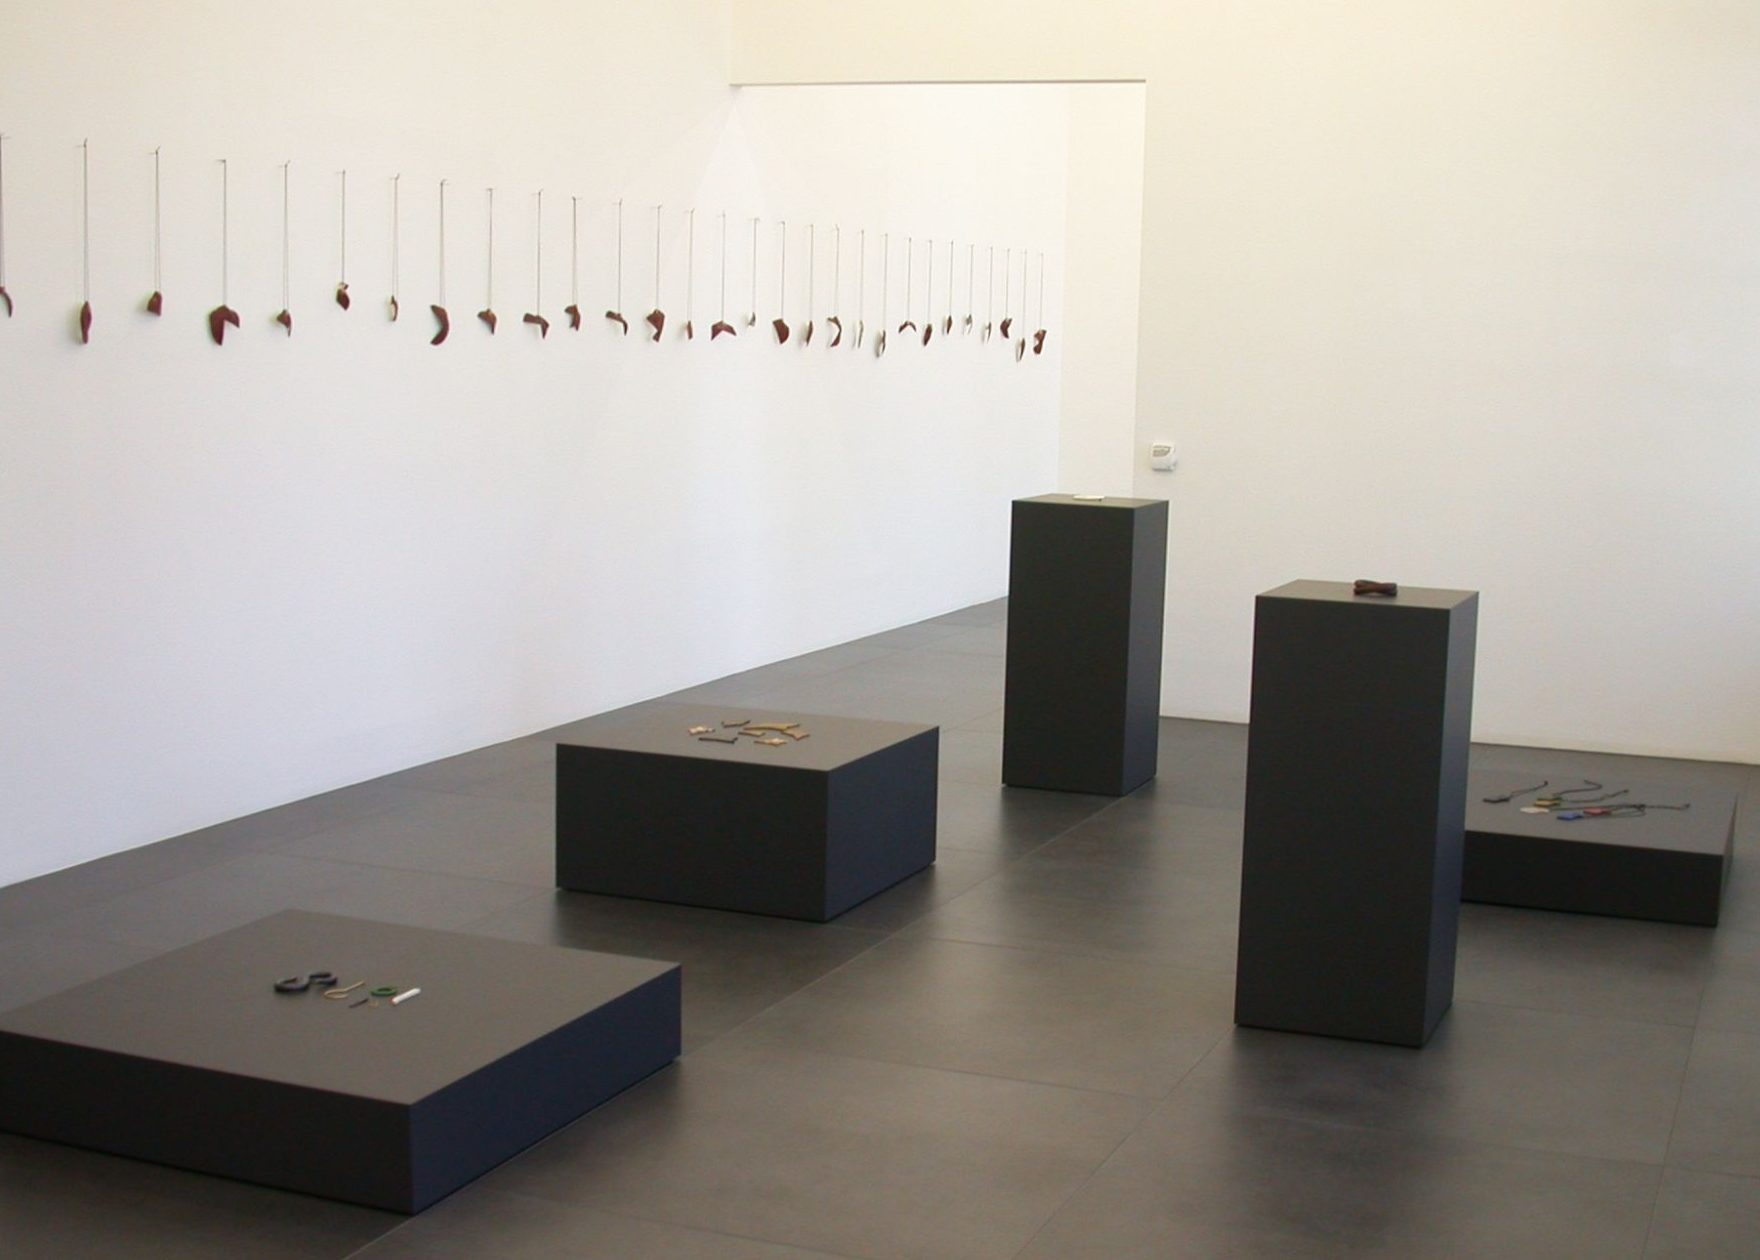 Warwick Freeman in Galerie Wittenbrink, 2014. Foto met dank aan Galerie Wittenbrink©